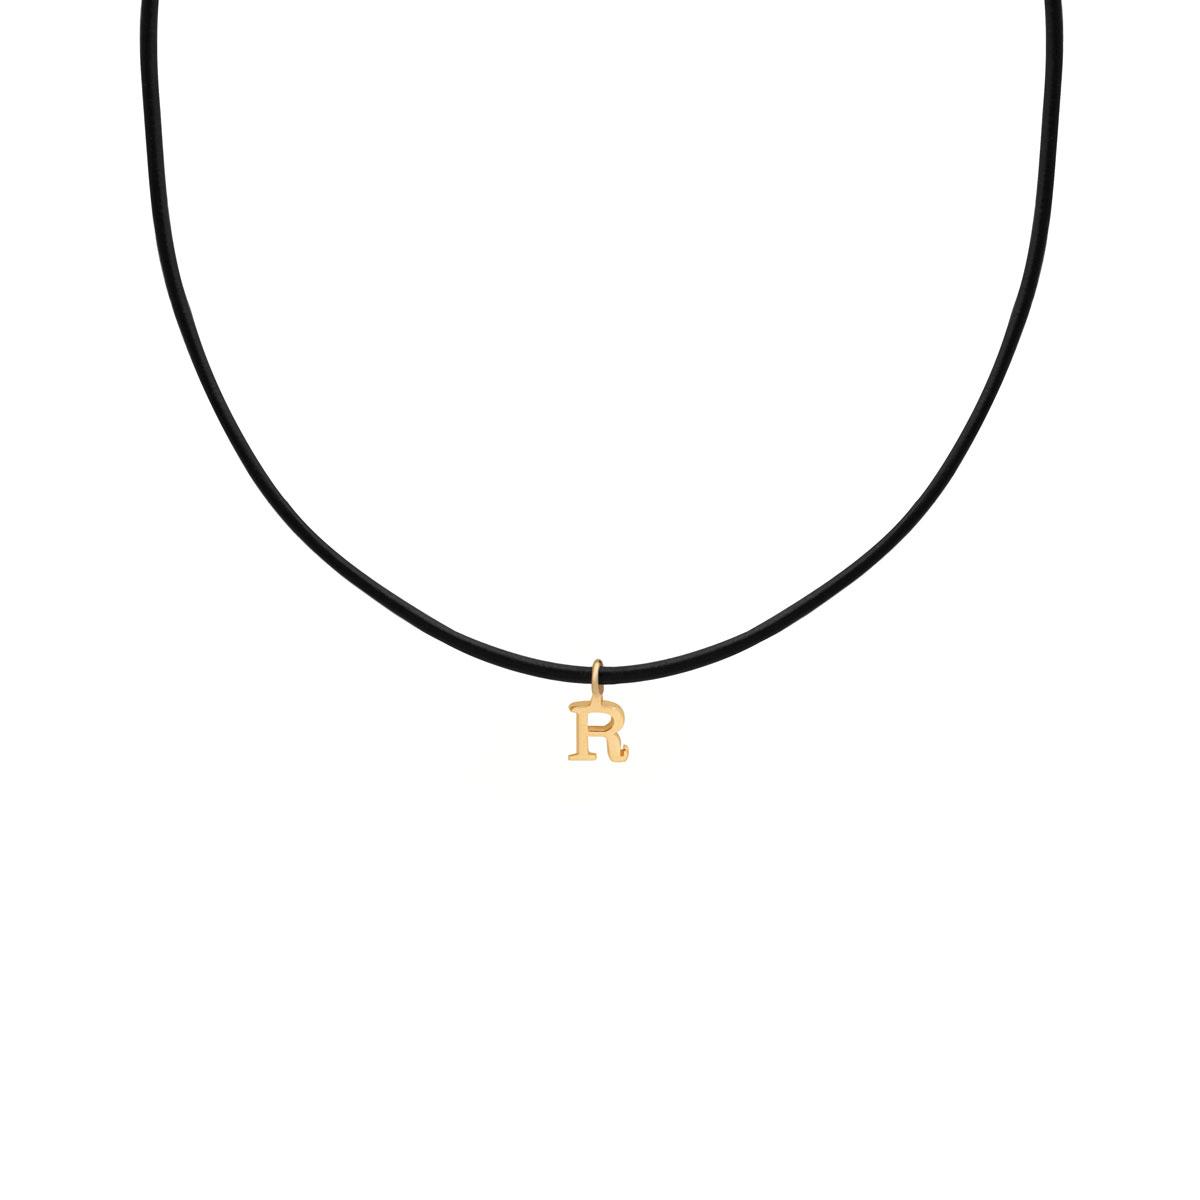 پرسته گردنبند طلا R